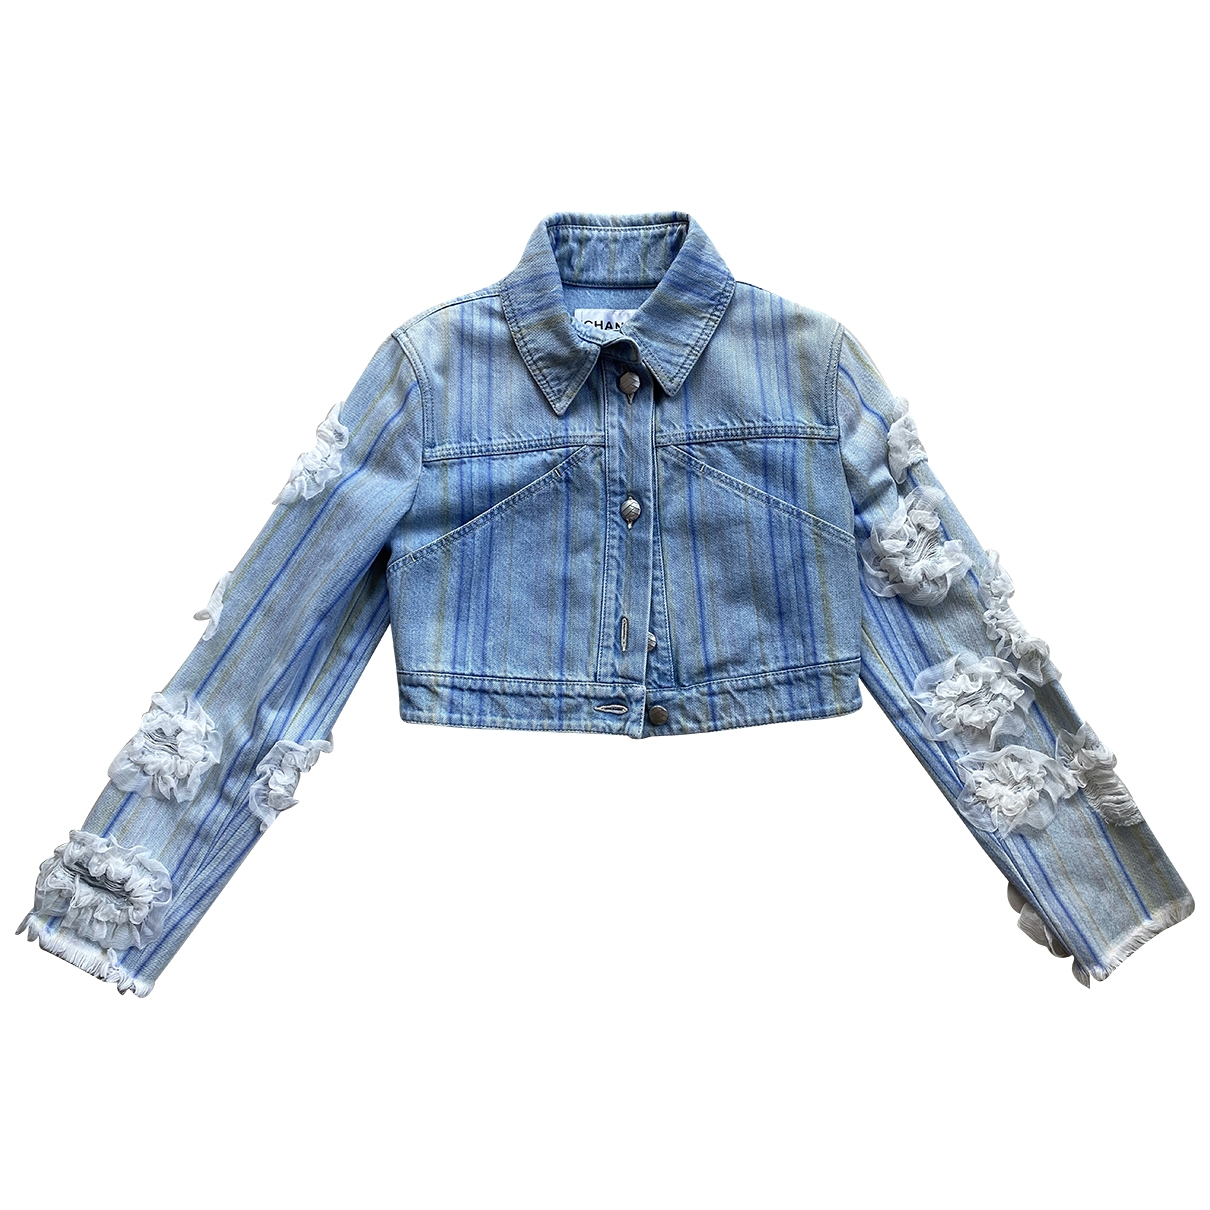 Chanel \N Jacke in  Blau Denim - Jeans